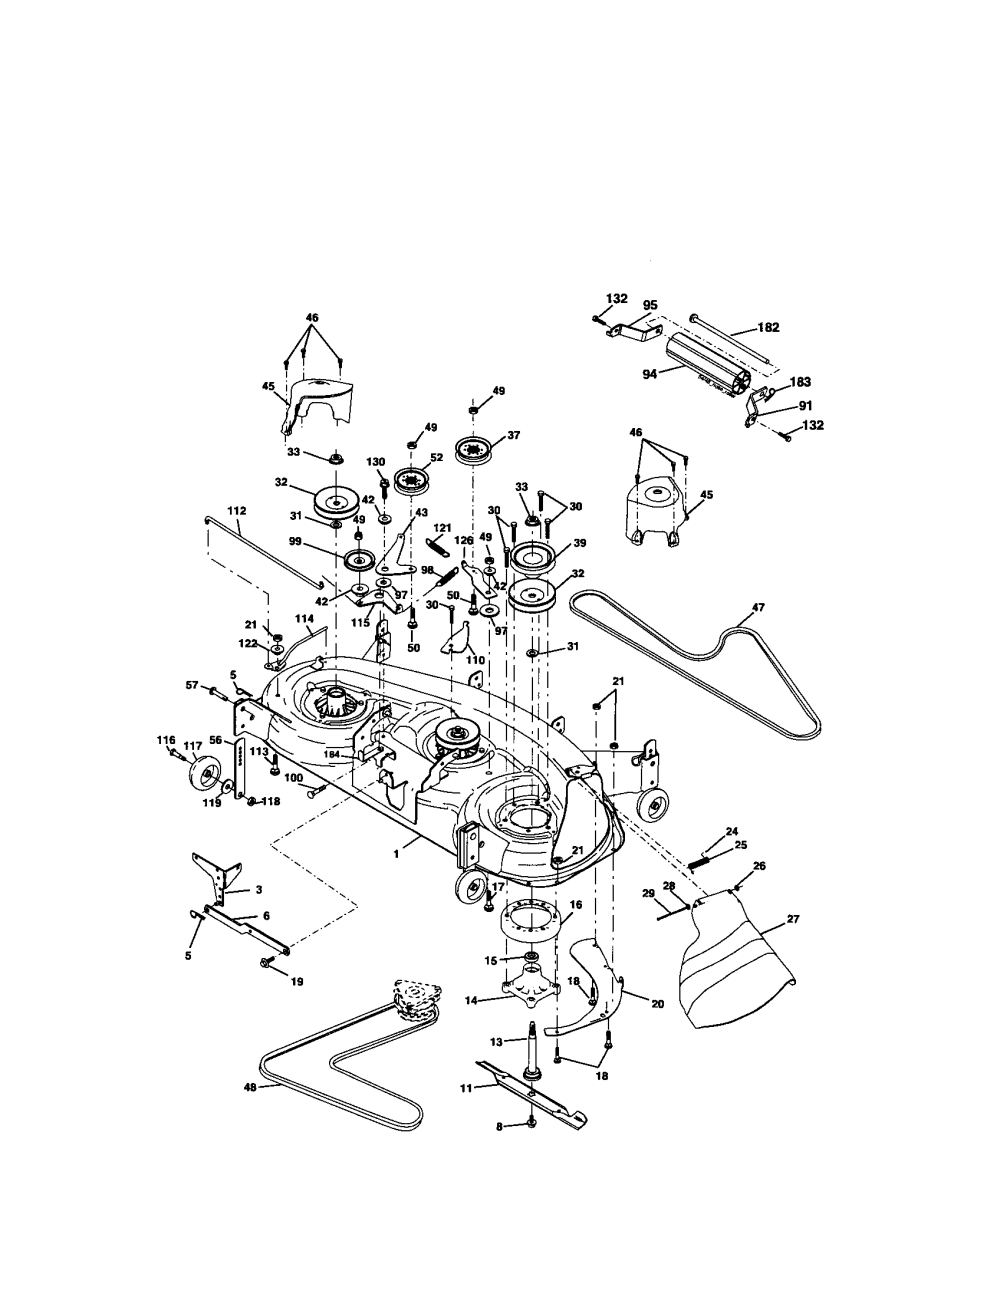 medium resolution of looking for craftsman model 917276320 front engine lawn tractor craftsman 917276320 mower deck diagram